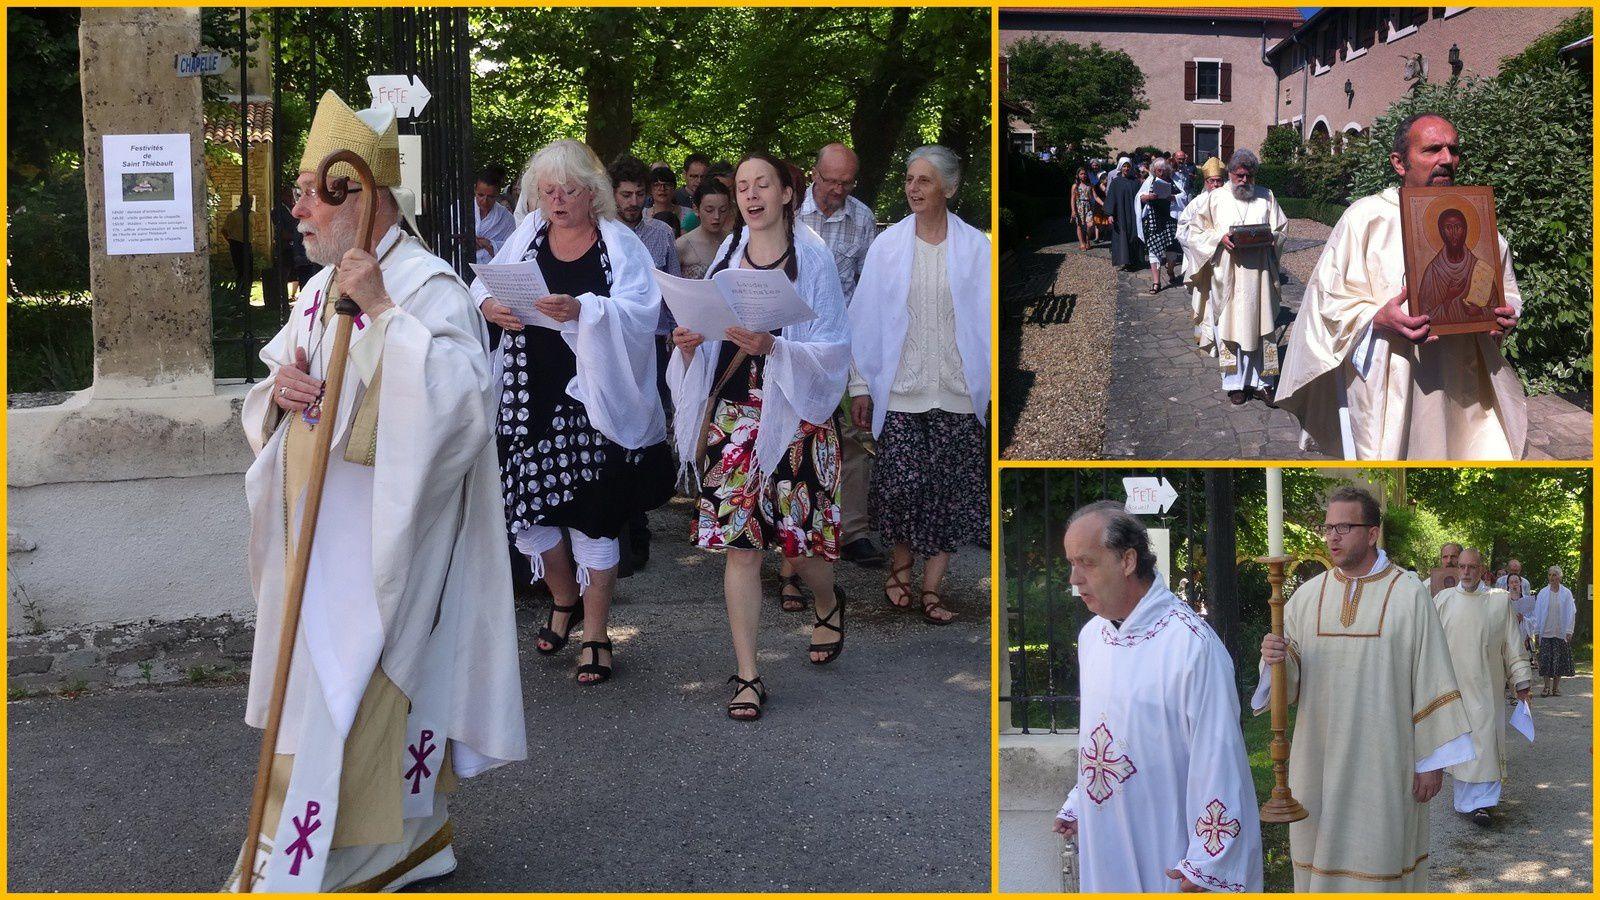 Festivités de la Saint Thiébault en photos